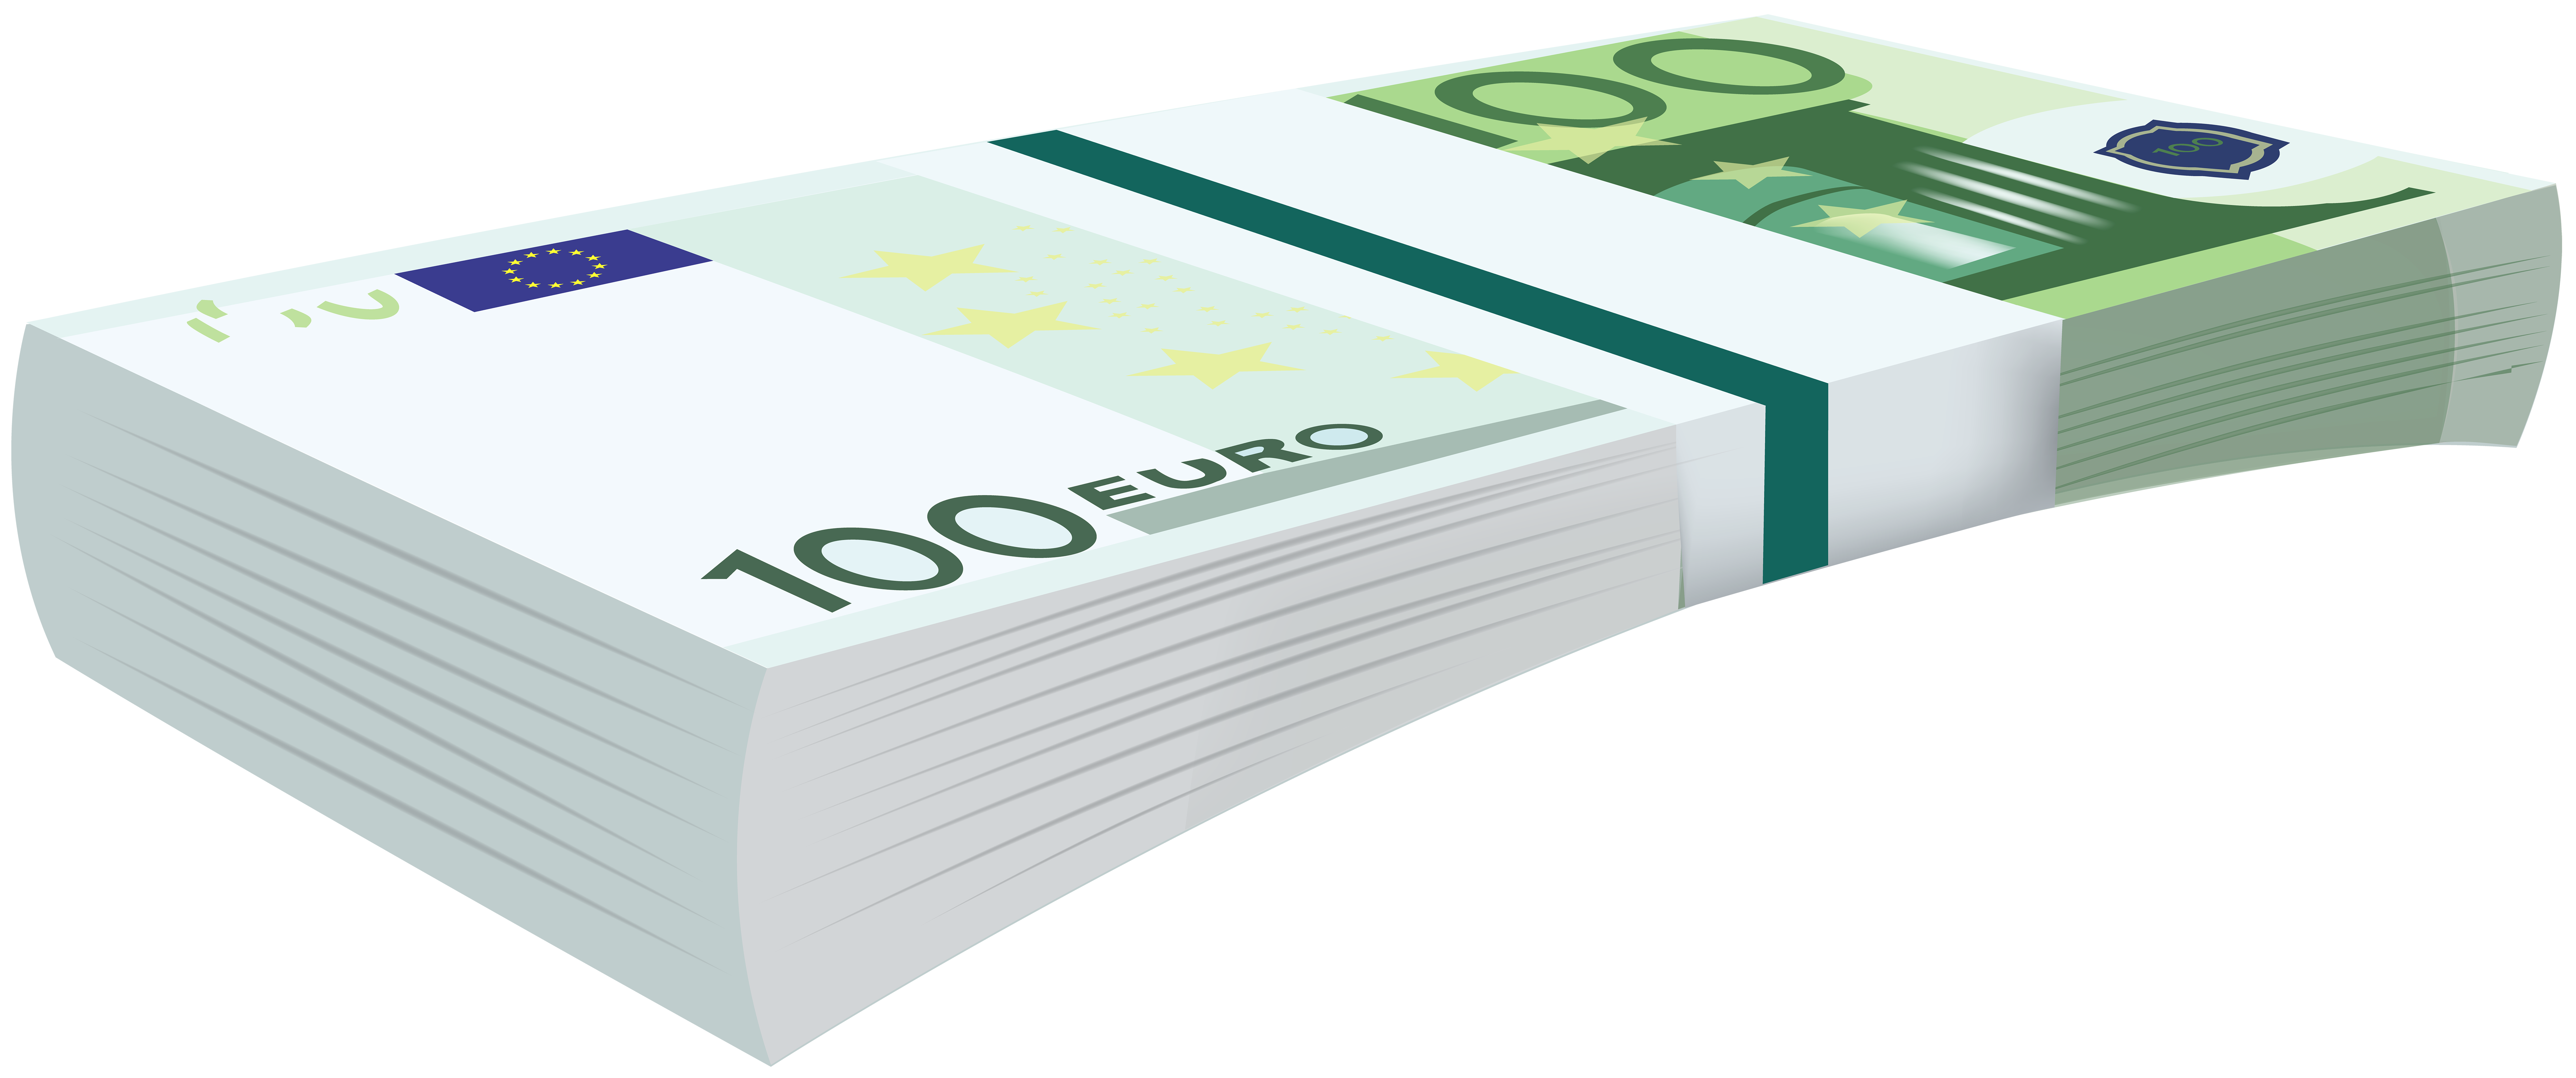 100 Euro Bundle Banknotes Transparent PNG Clip Art Image.